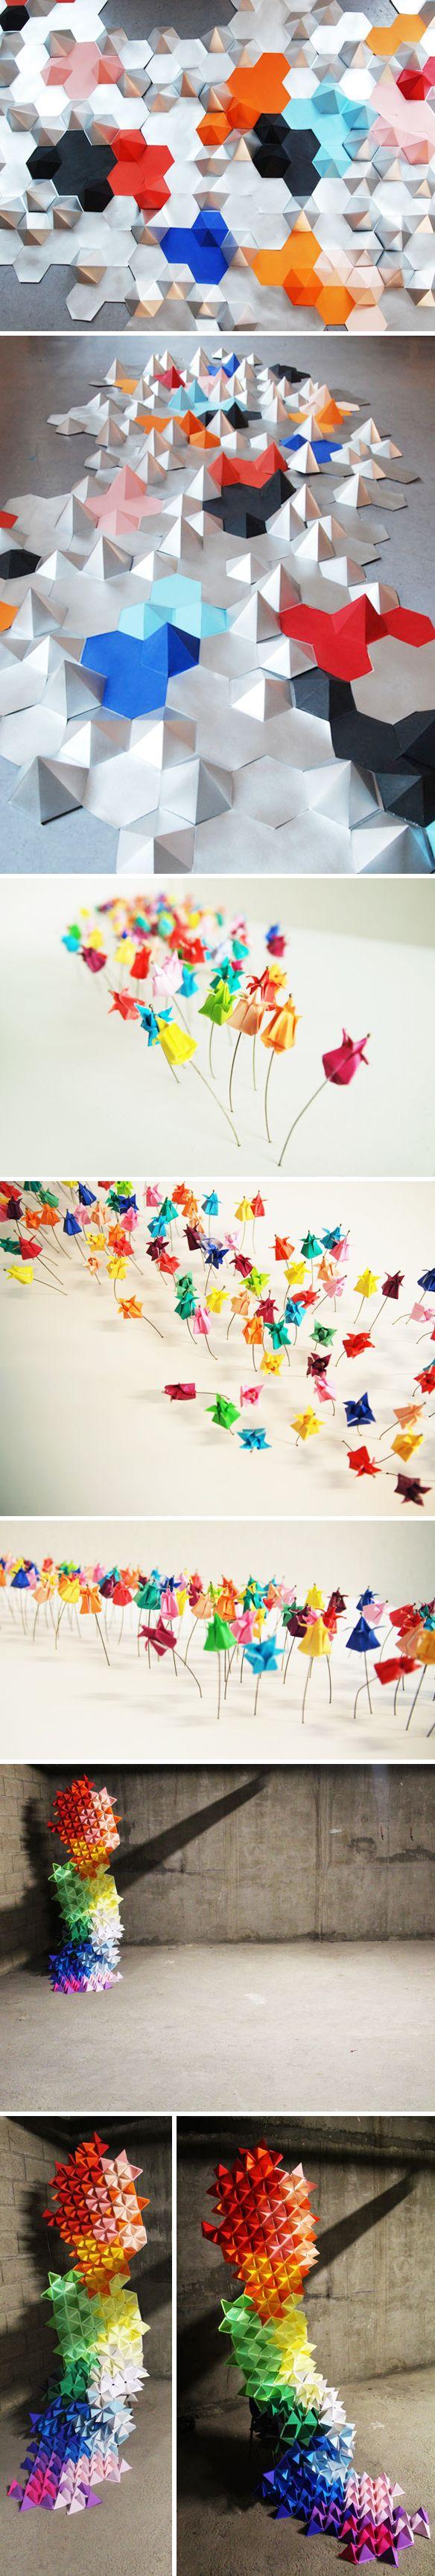 laure devenelle paper installations | The Jealous Curator | Bloglovin